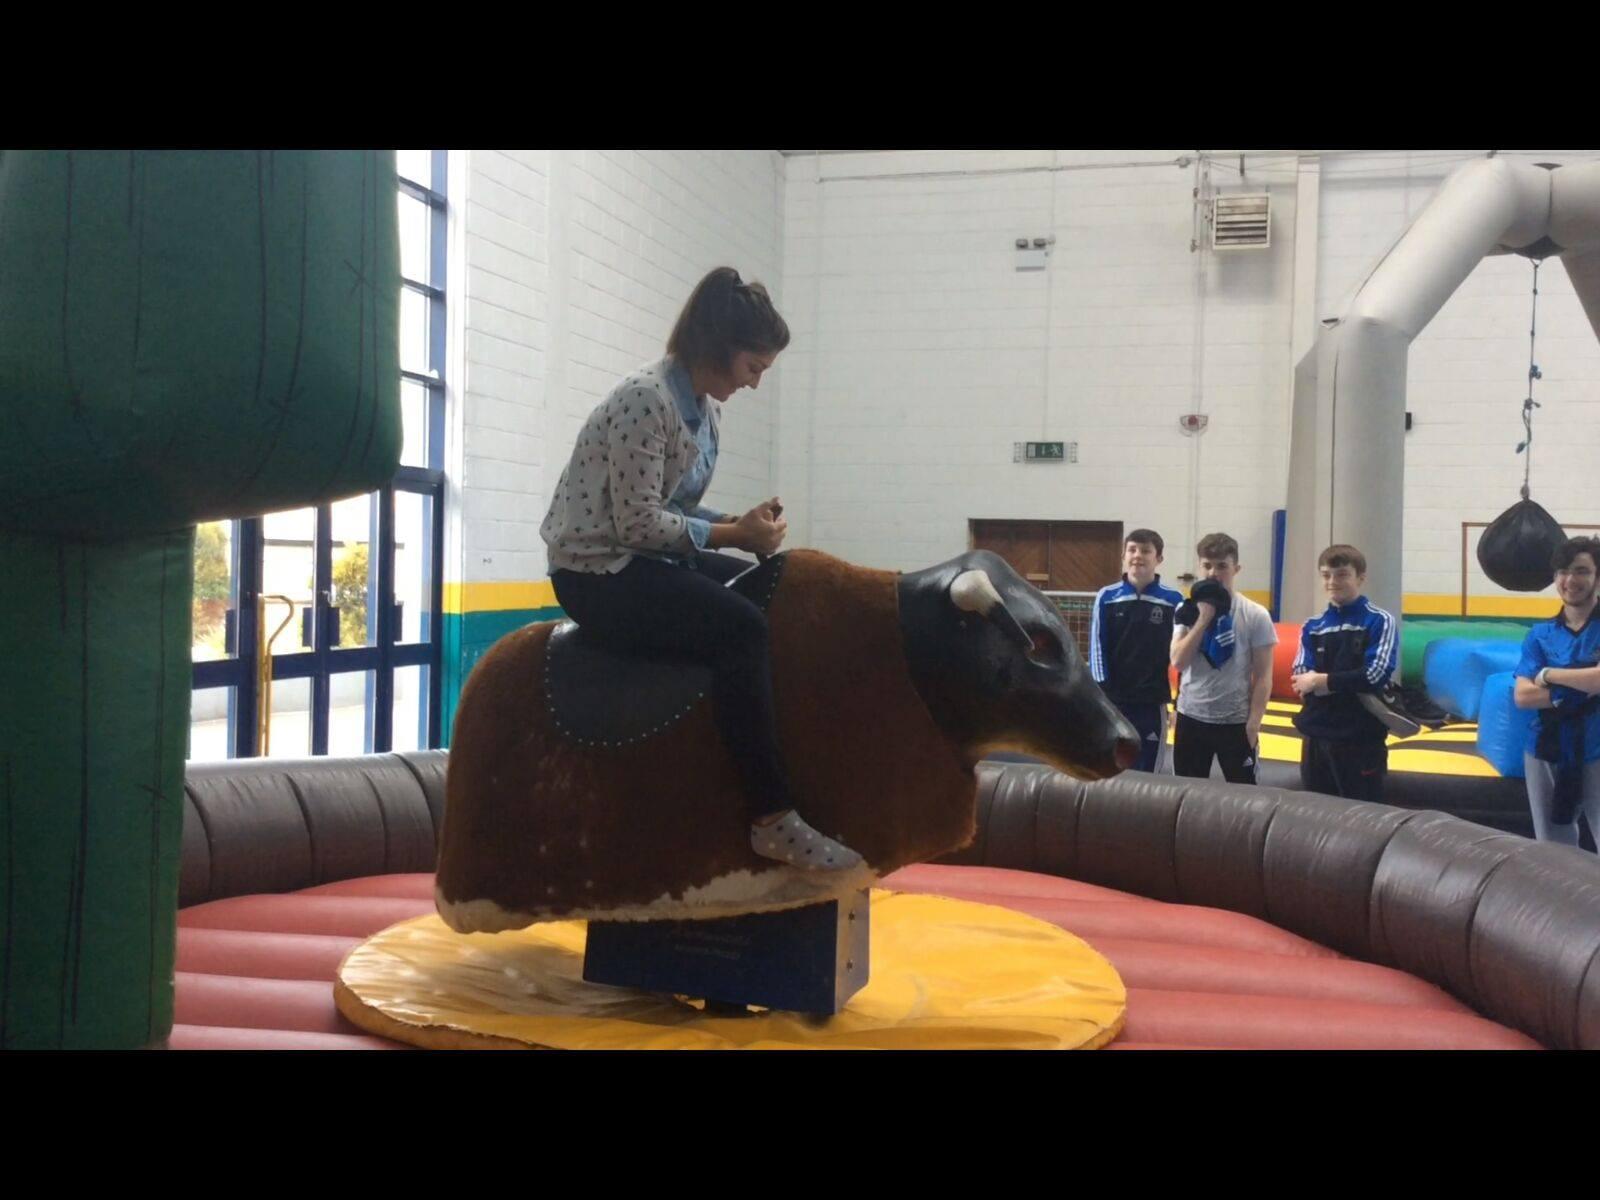 2016 April 18th: Active Schools Week 2016 in Desmond College: Monday